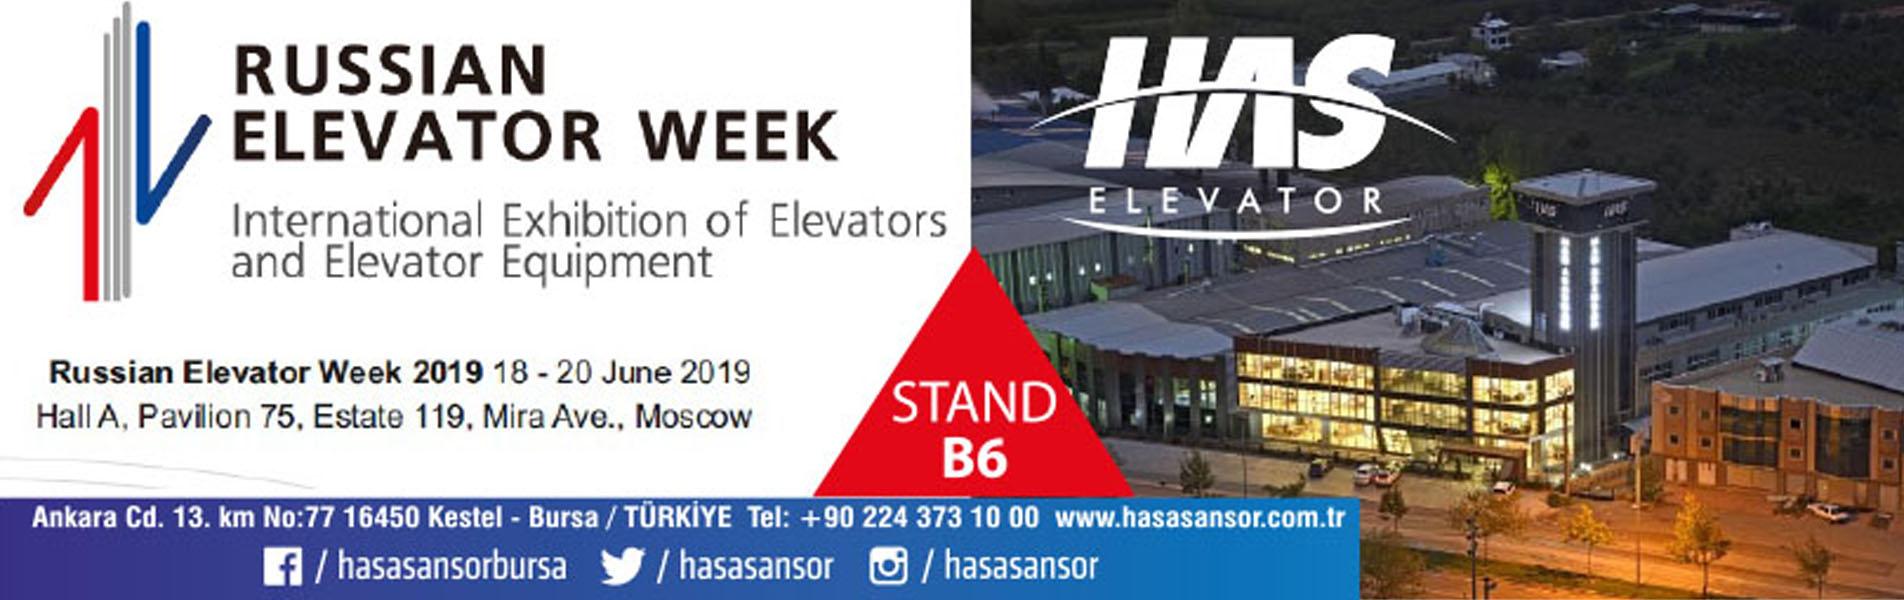 HAS Elevator - Turkey Elevator - Turkey Elevator Plant